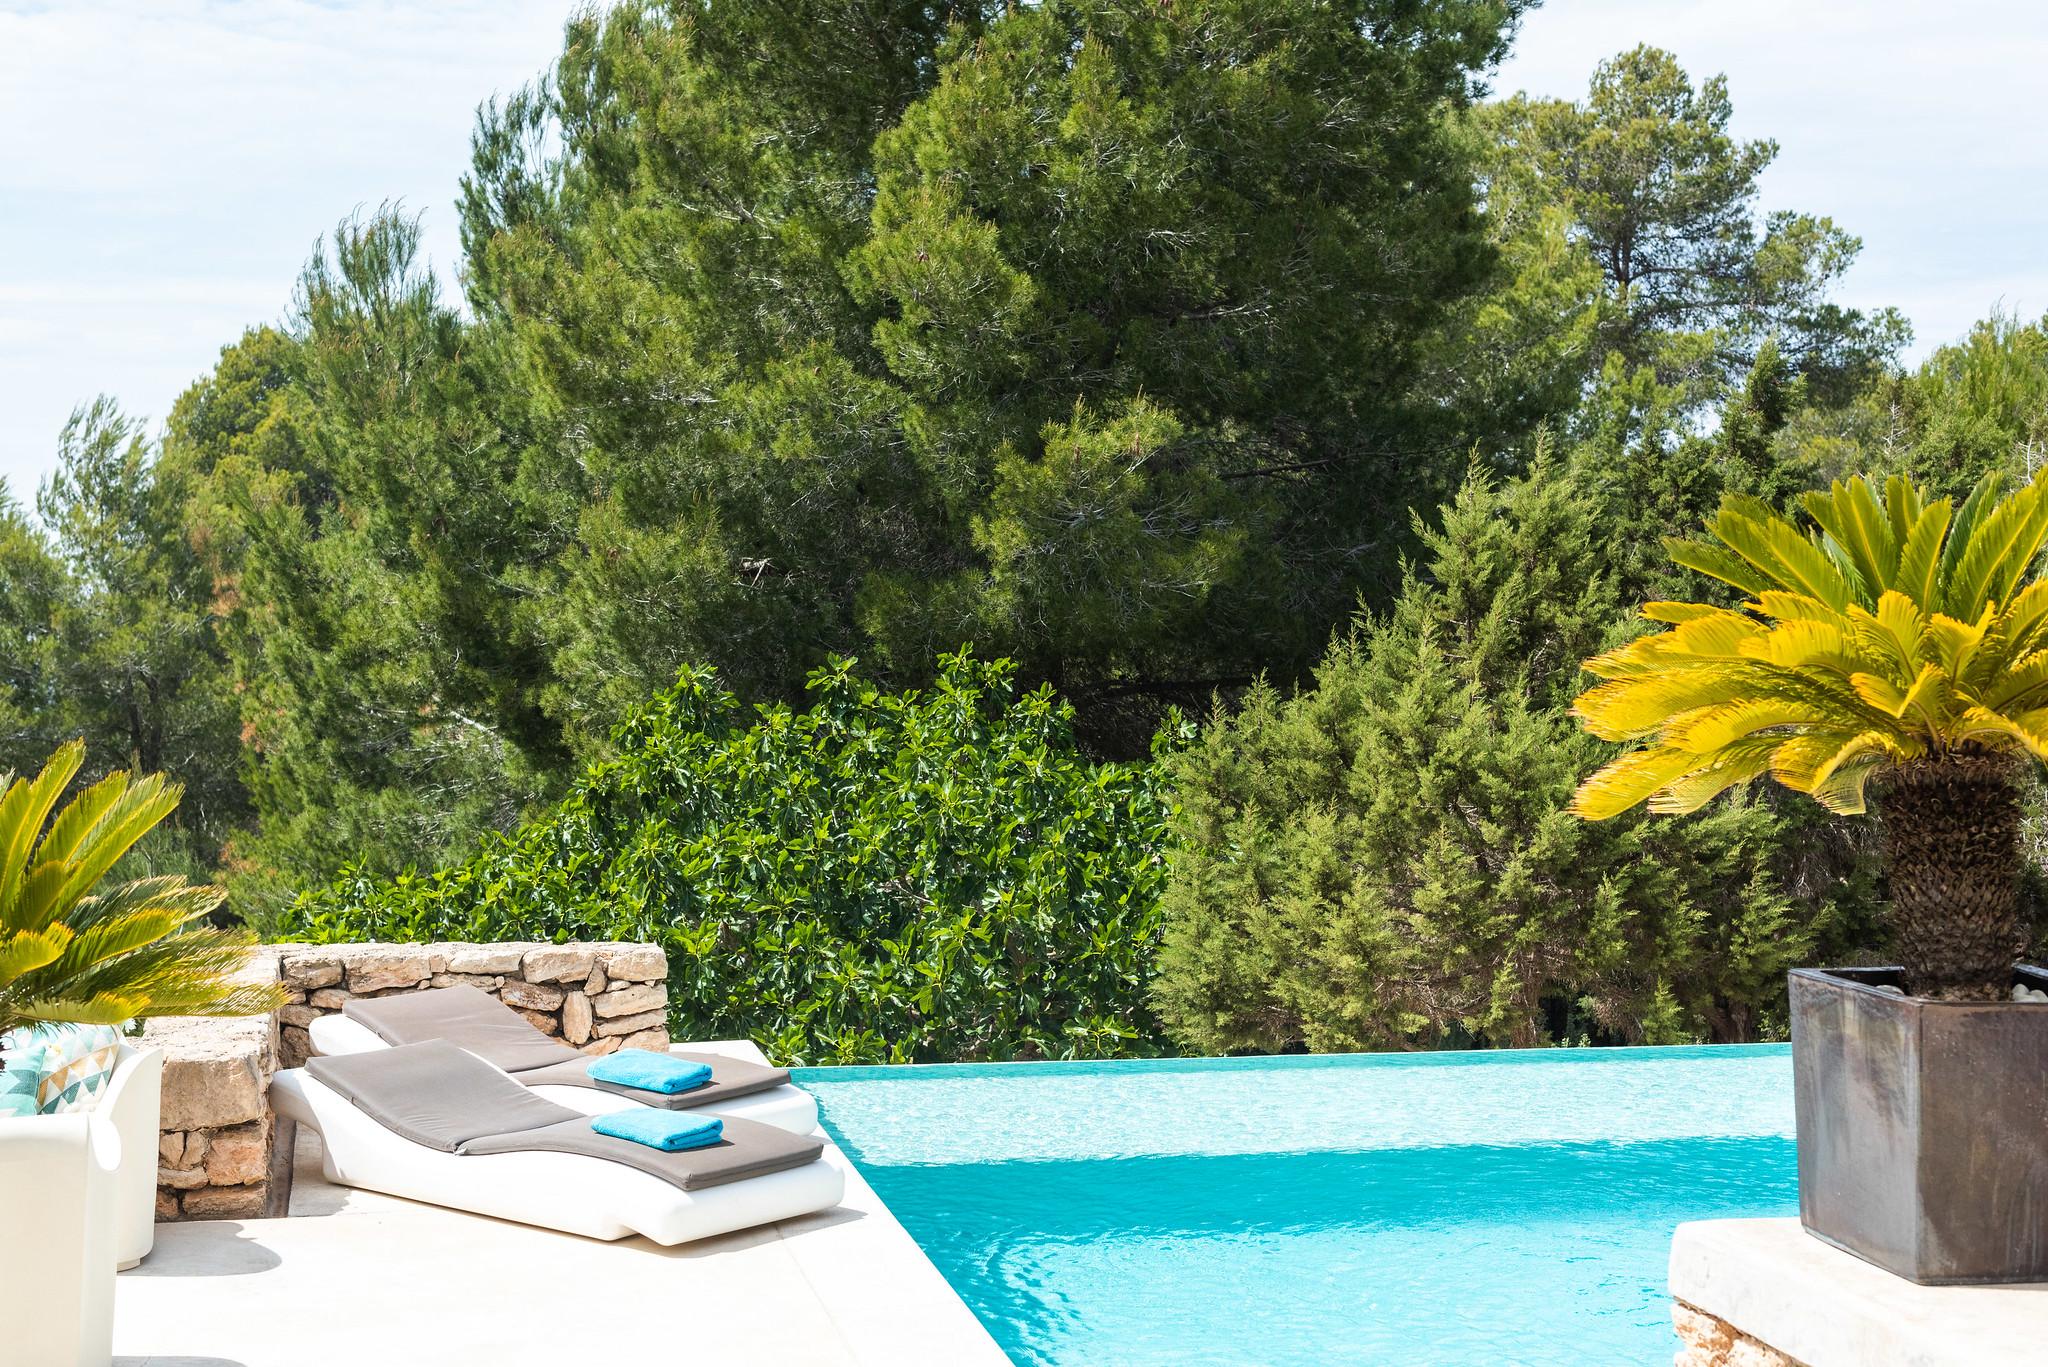 https://www.white-ibiza.com/wp-content/uploads/2020/06/white-ibiza-villas-villa-azul-exterior-pool.jpg